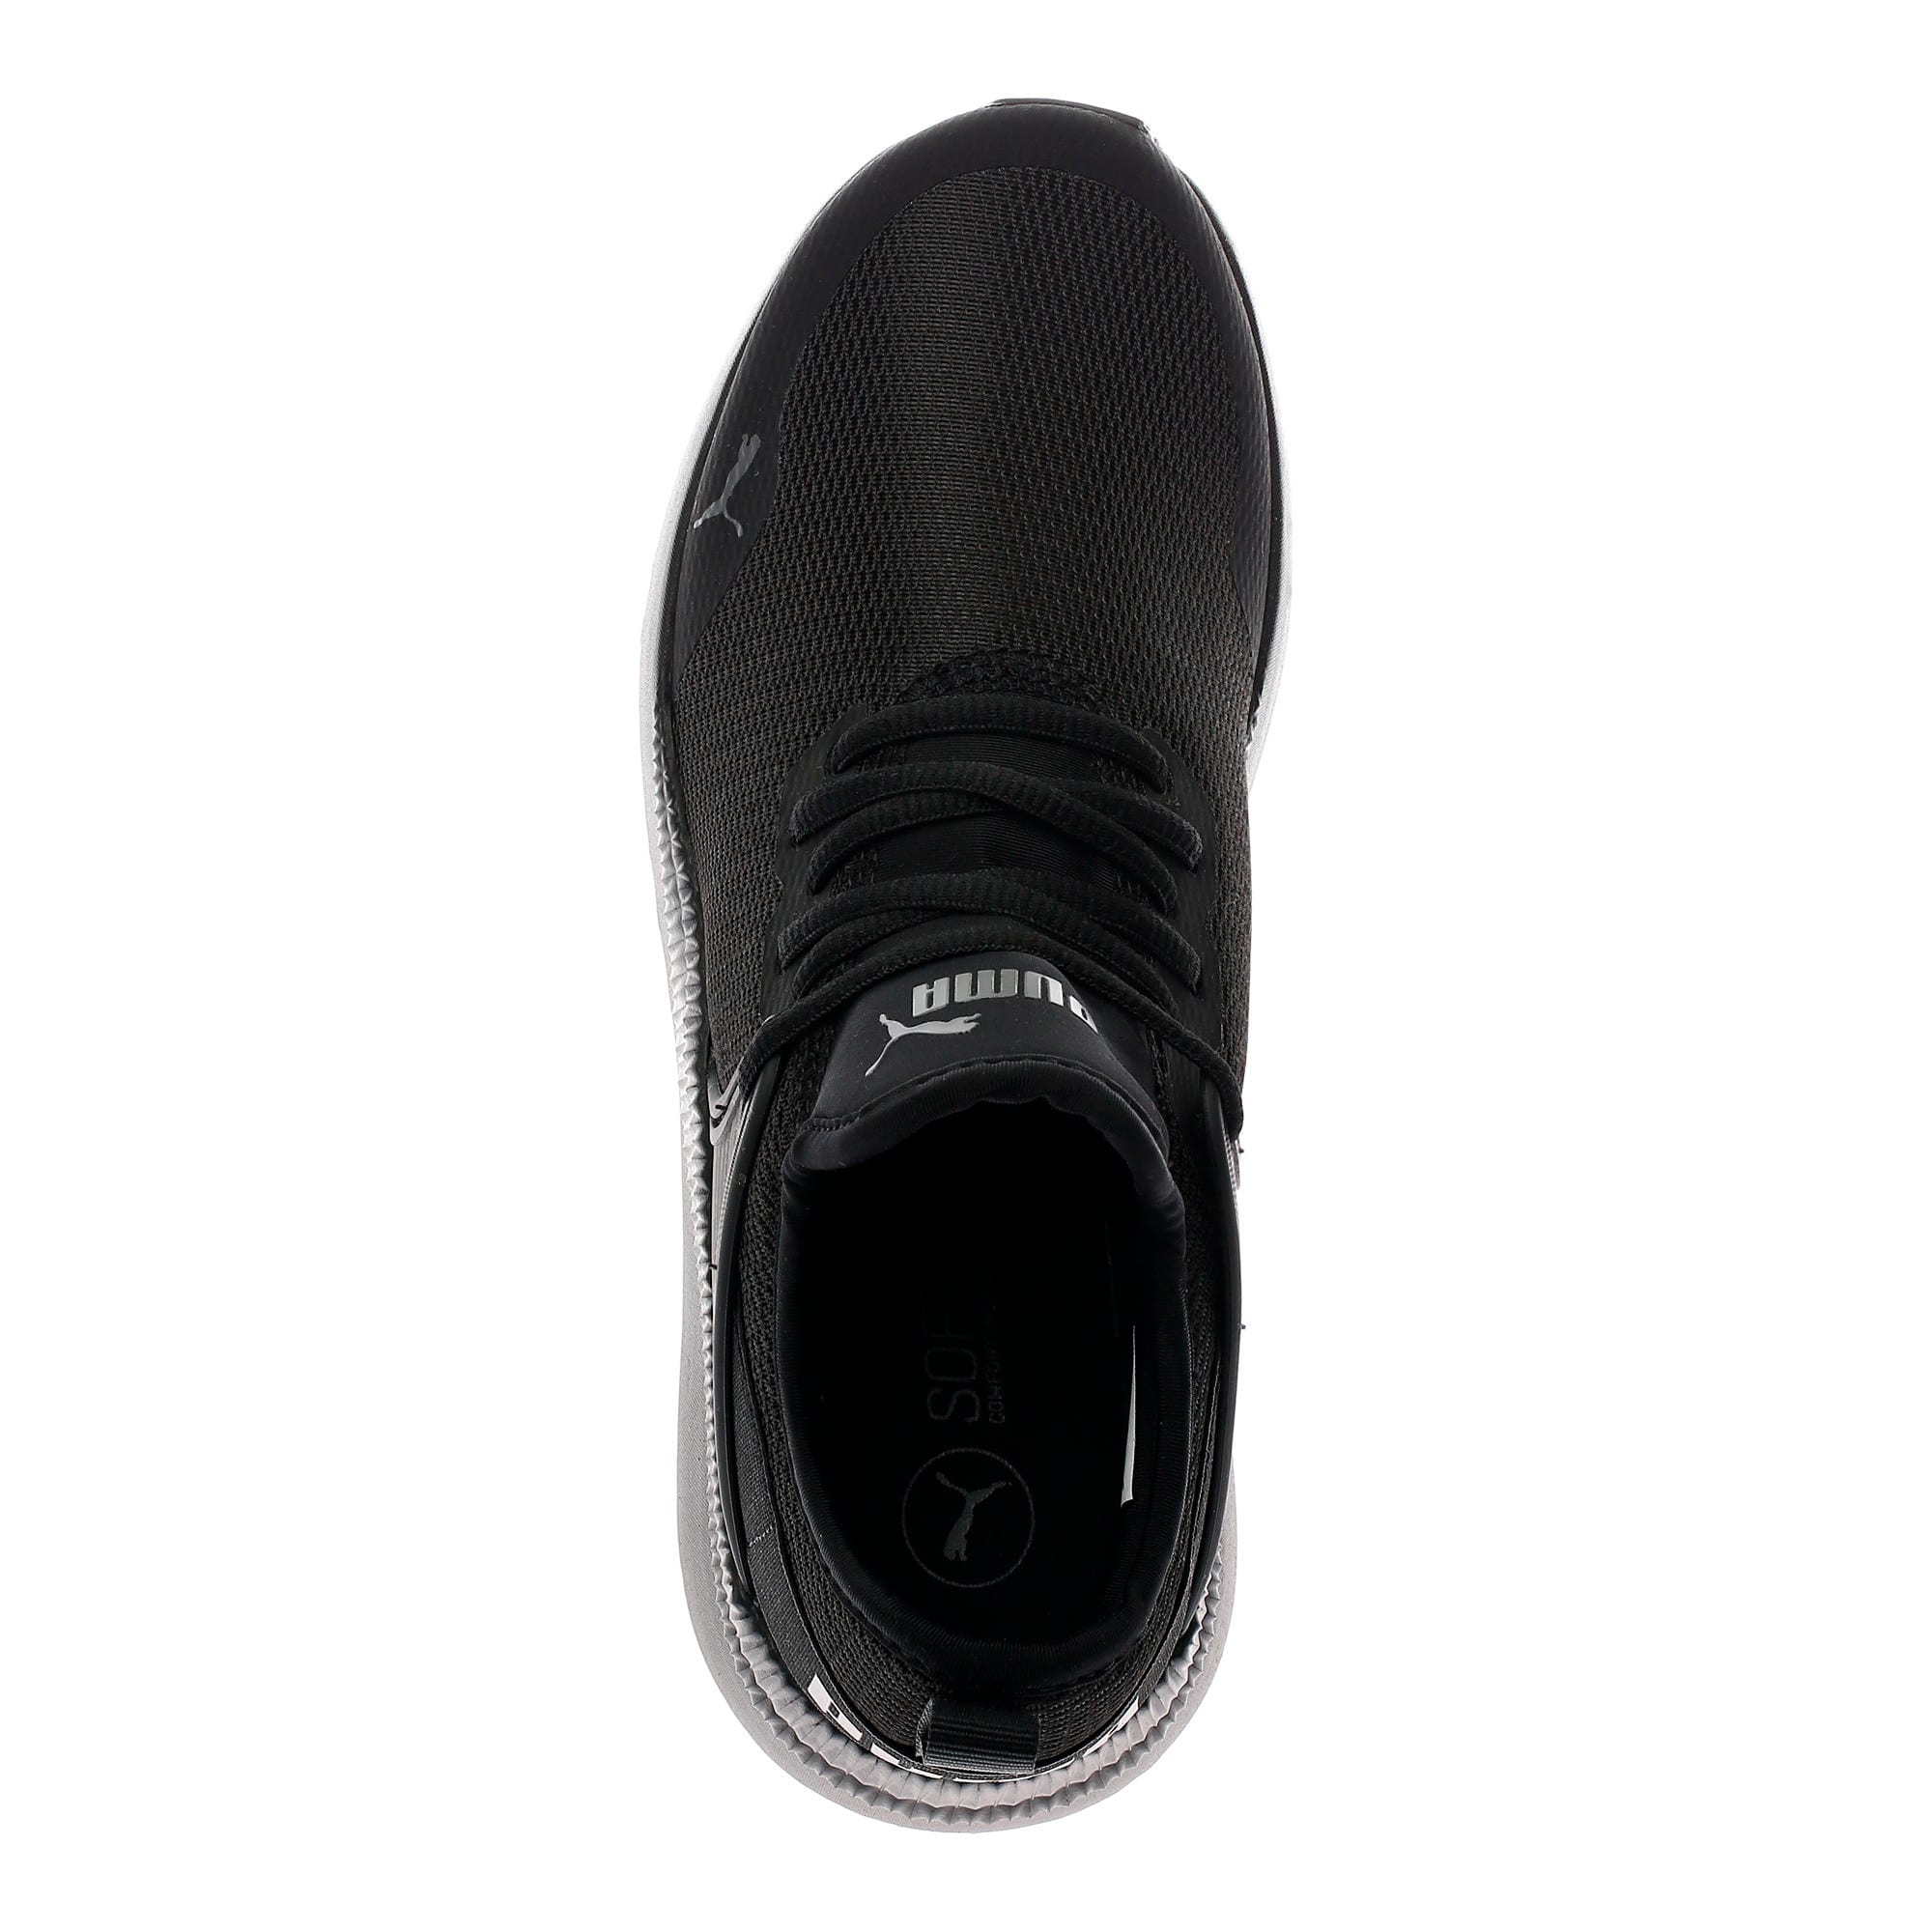 Thumbnail 5 of Pacer Next Cage Sneakers JR, Puma Black-Puma Black, medium